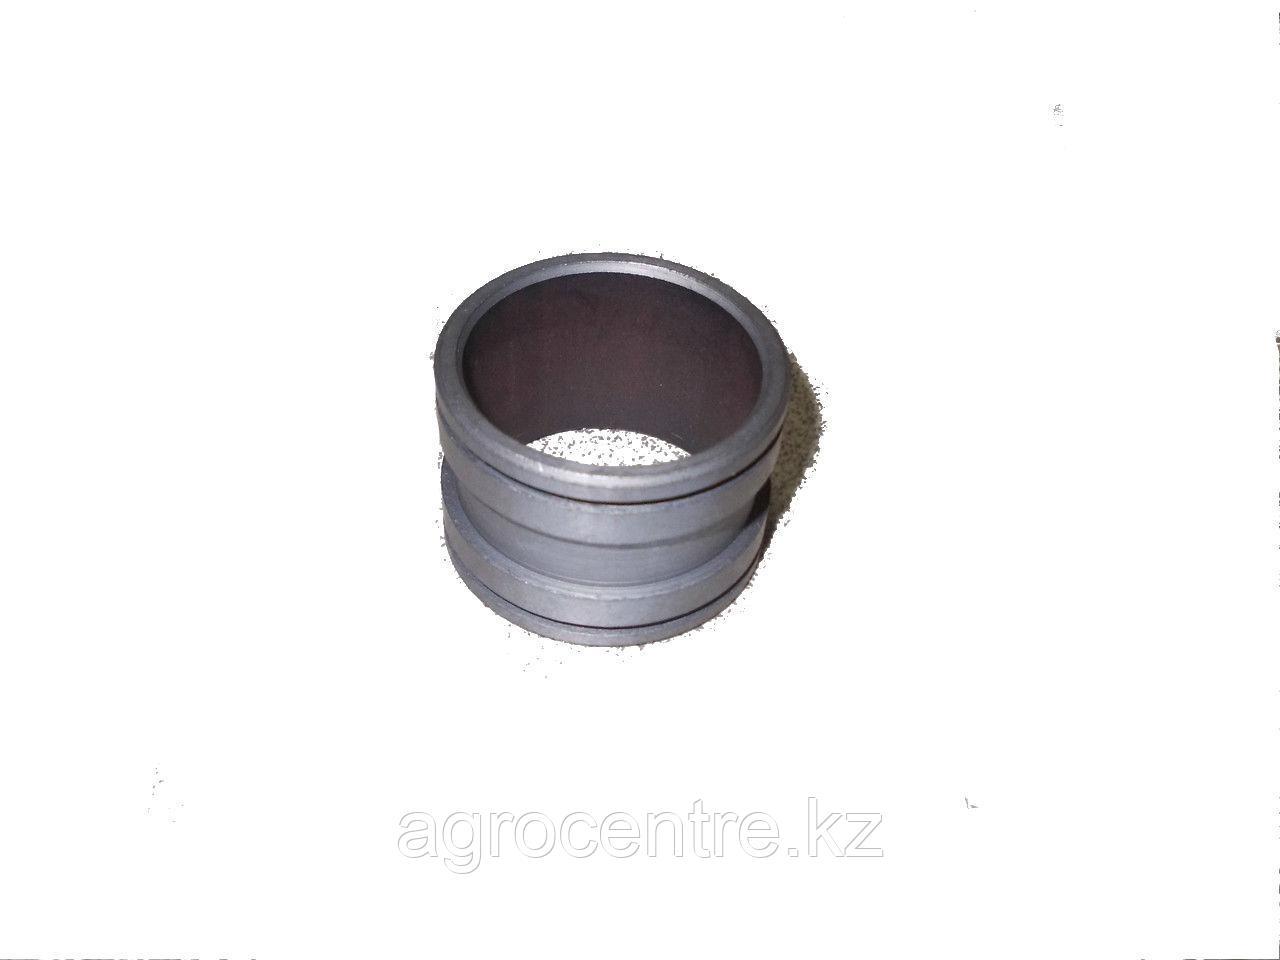 Компенсатор глушителя МТЗ-1221(260-1008023)